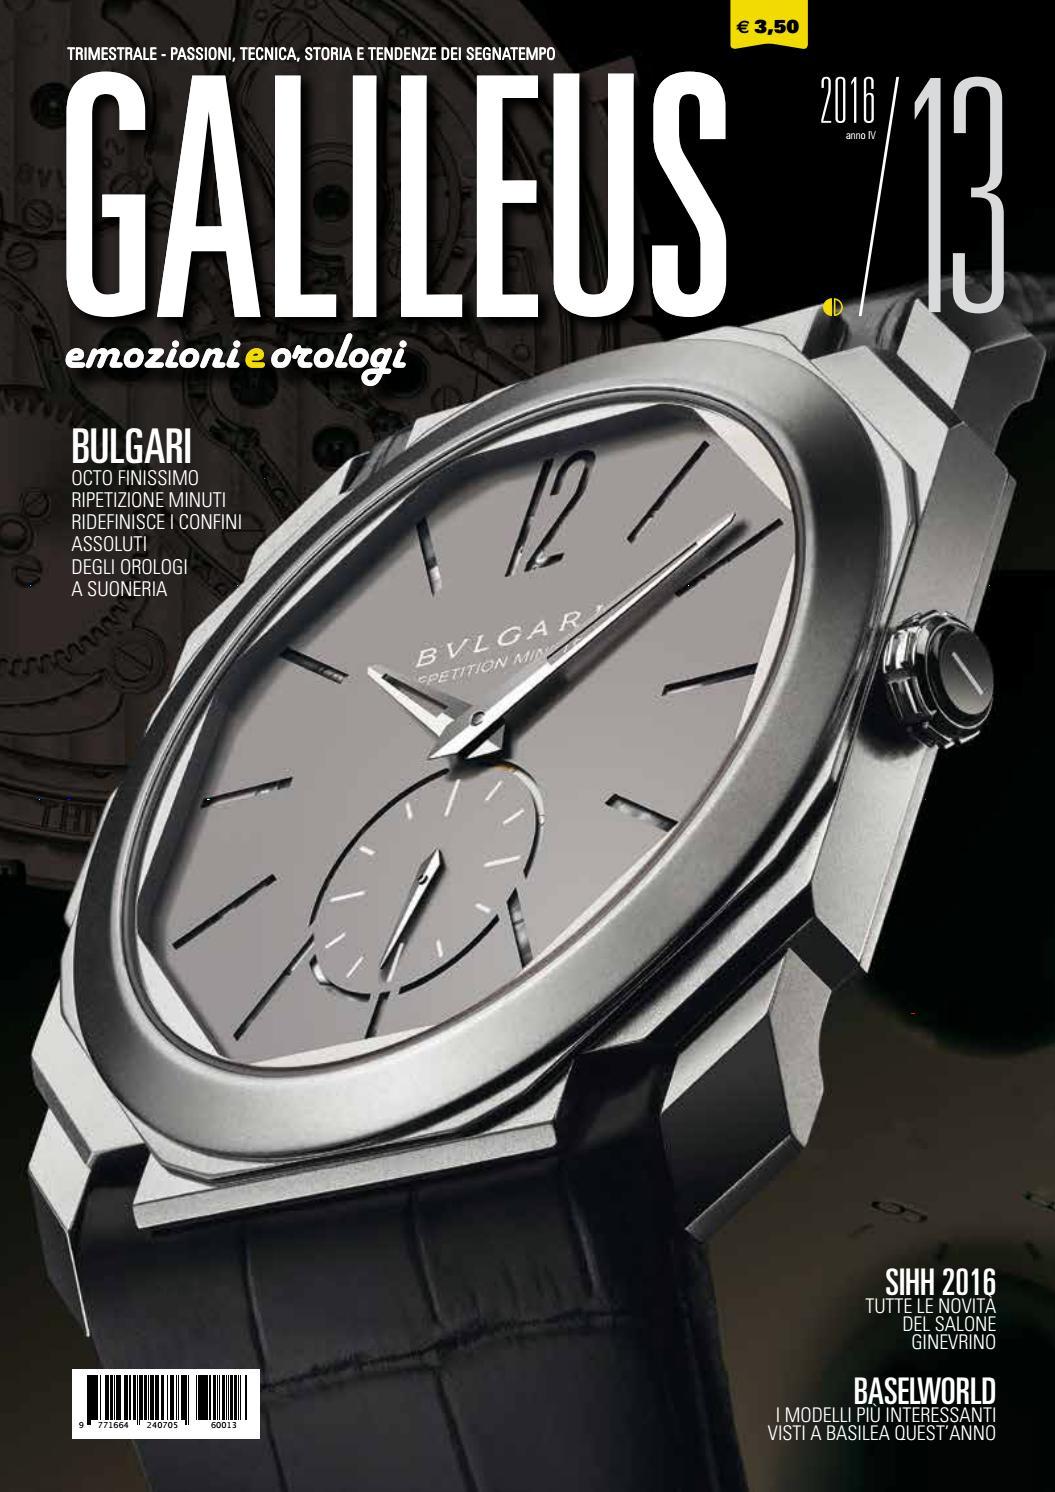 745ae9334935b4 Galileus 13/2016 - primavera 2016 by Galileus Emozioni e Orologi - issuu